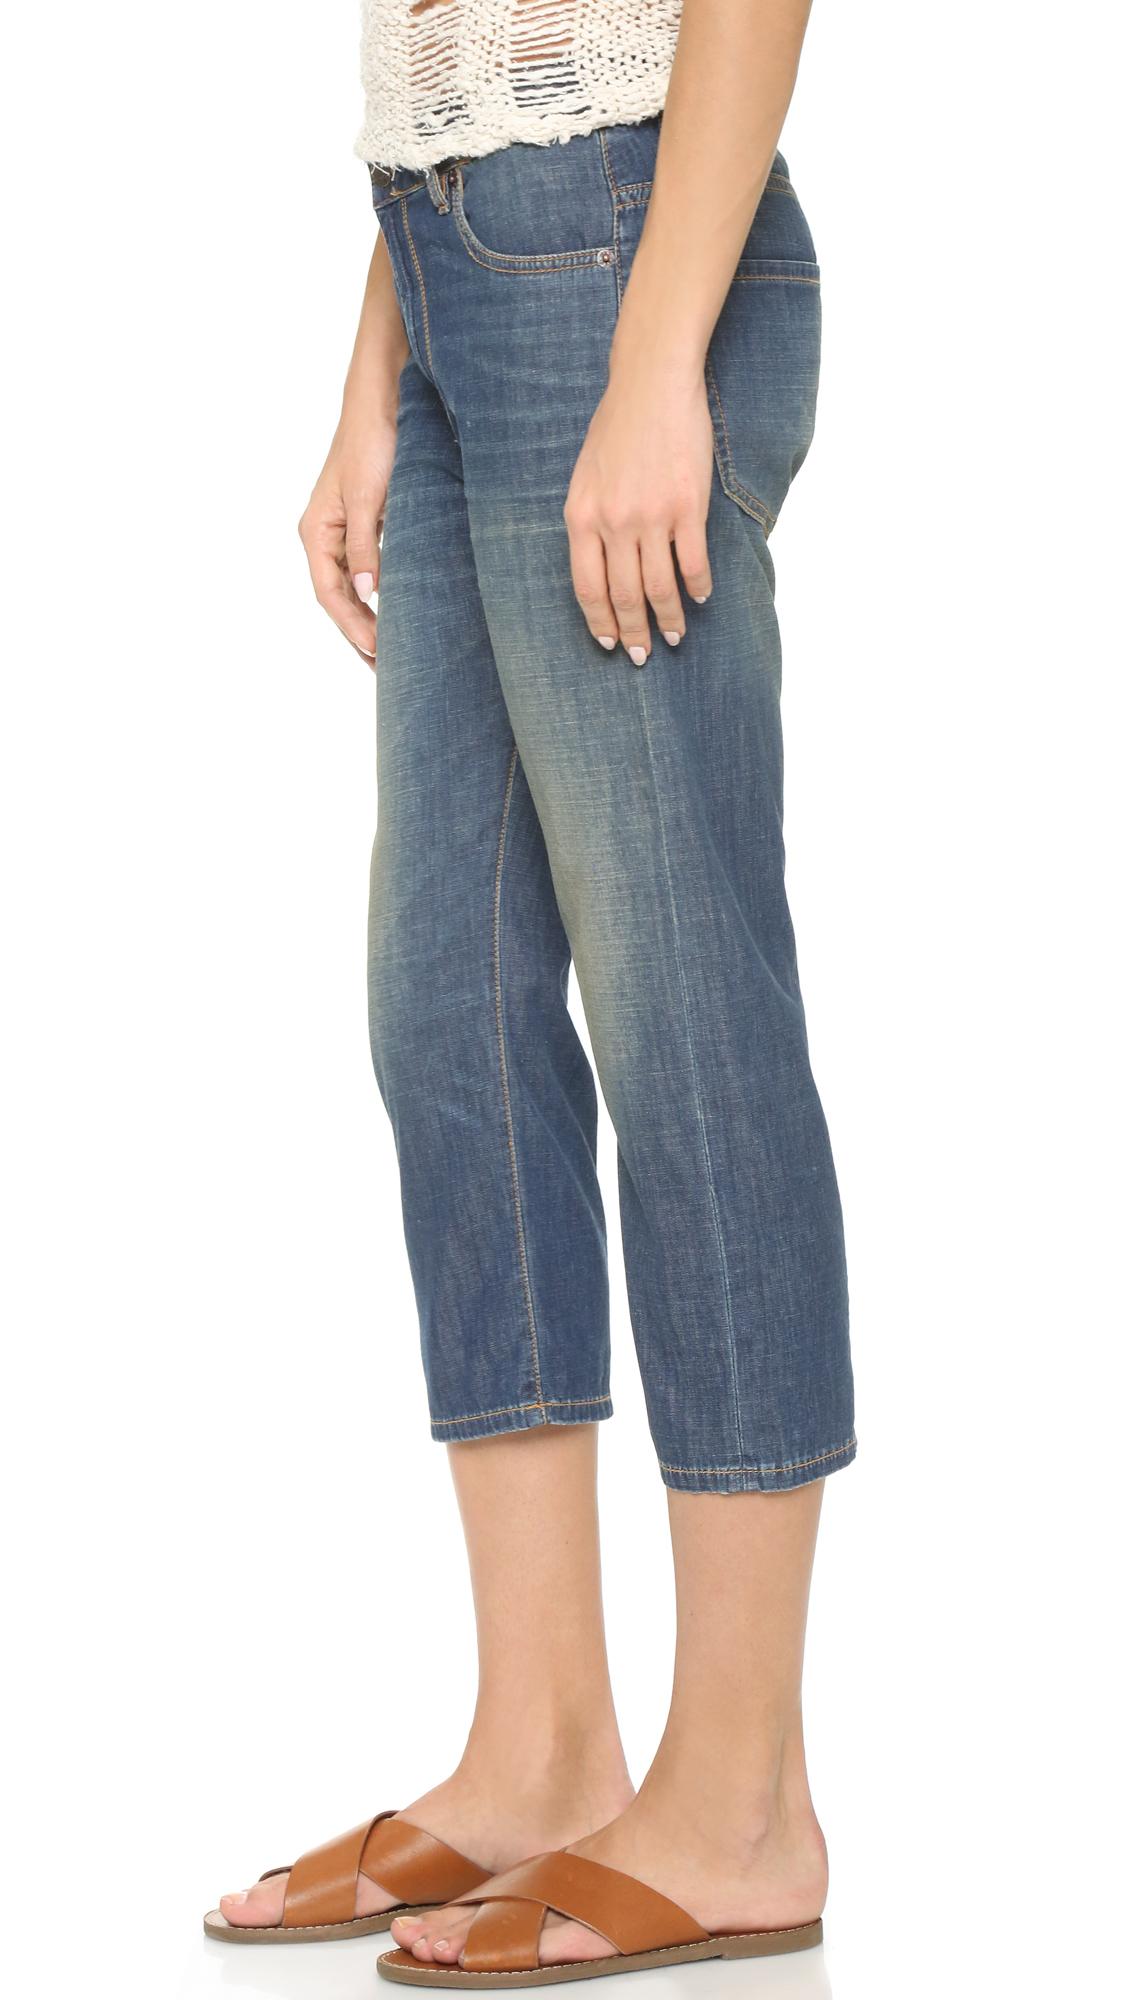 6397 Denim Loose Capri Jeans in Dirty Faded (Blue)